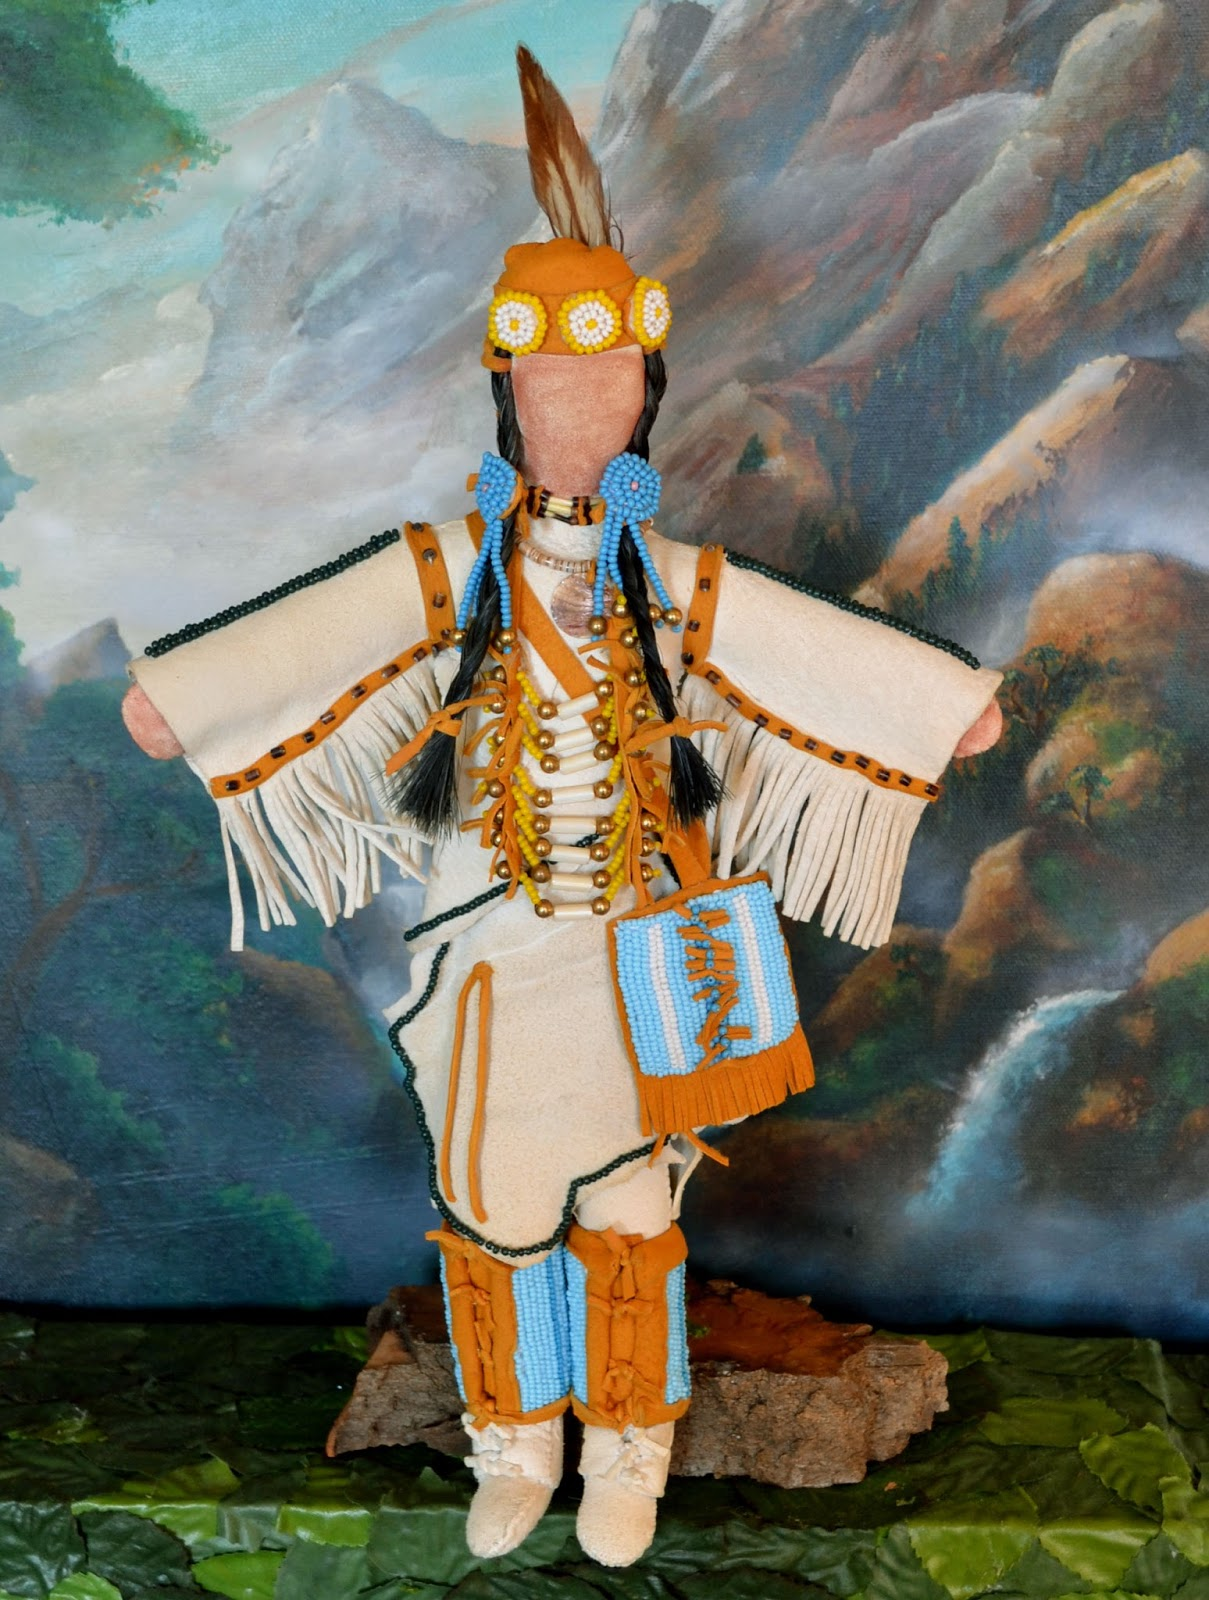 Native American Plains Indian Doll Handmade Ooak Hand